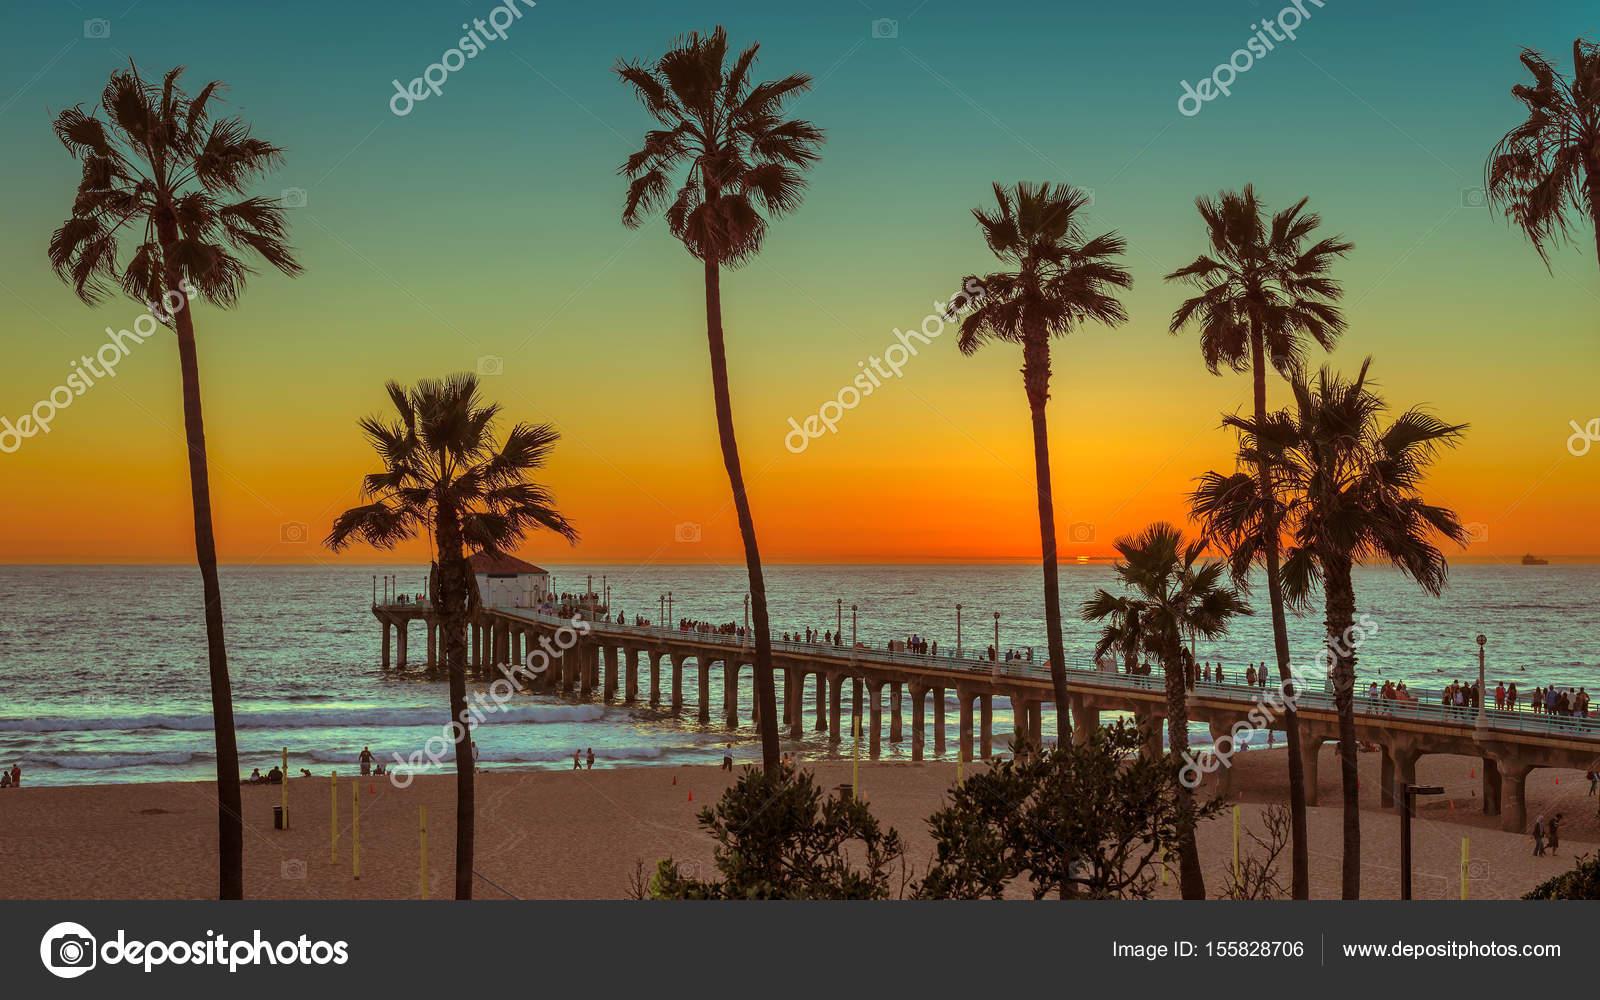 Los Angeles Palm Trees Wallpaper Palm Trees On Manhattan Beach